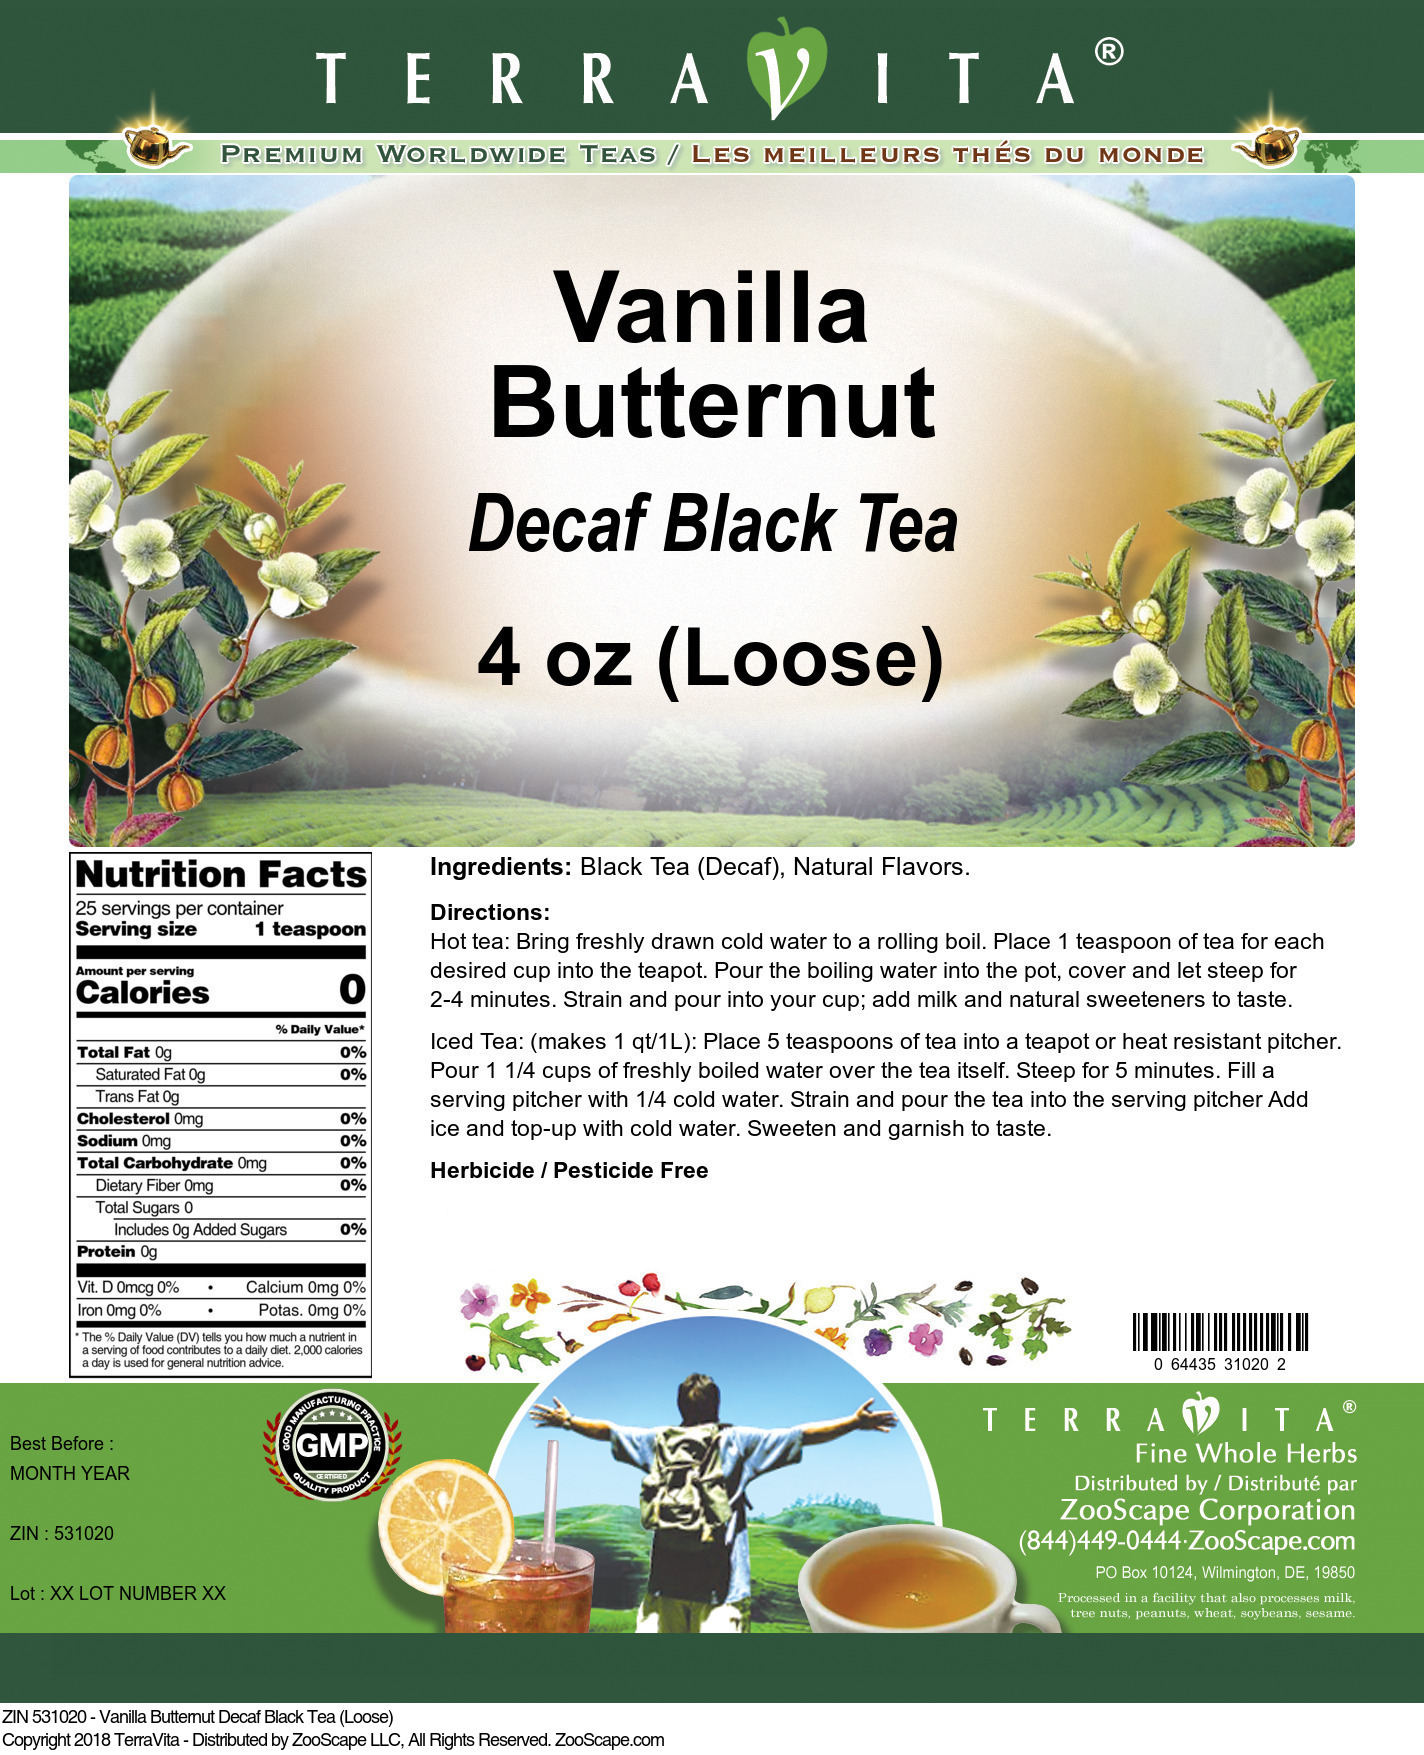 Vanilla Butternut Decaf Black Tea (Loose)